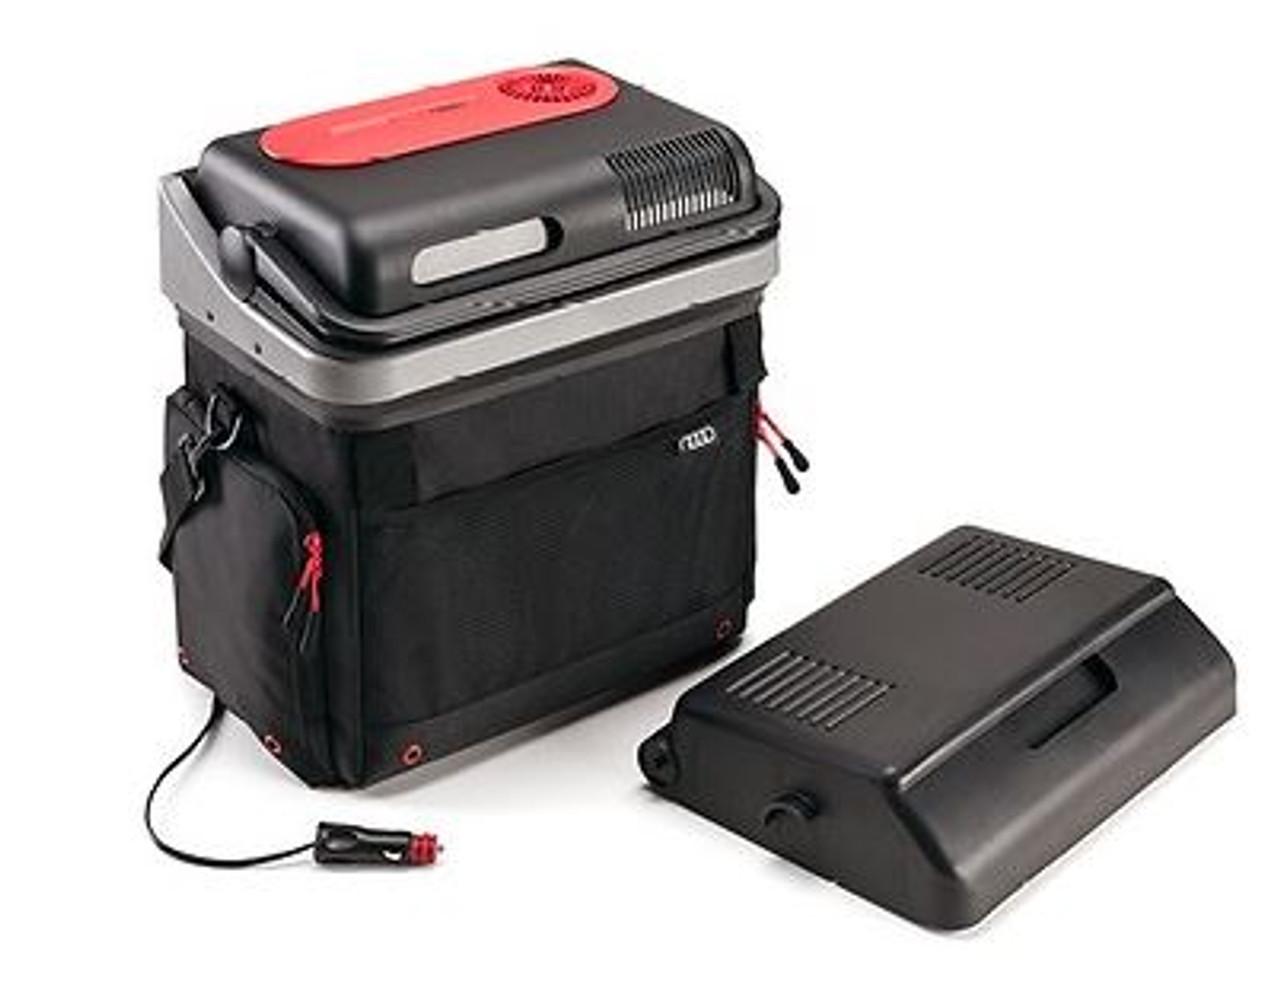 Audi Cool/Hot Bag